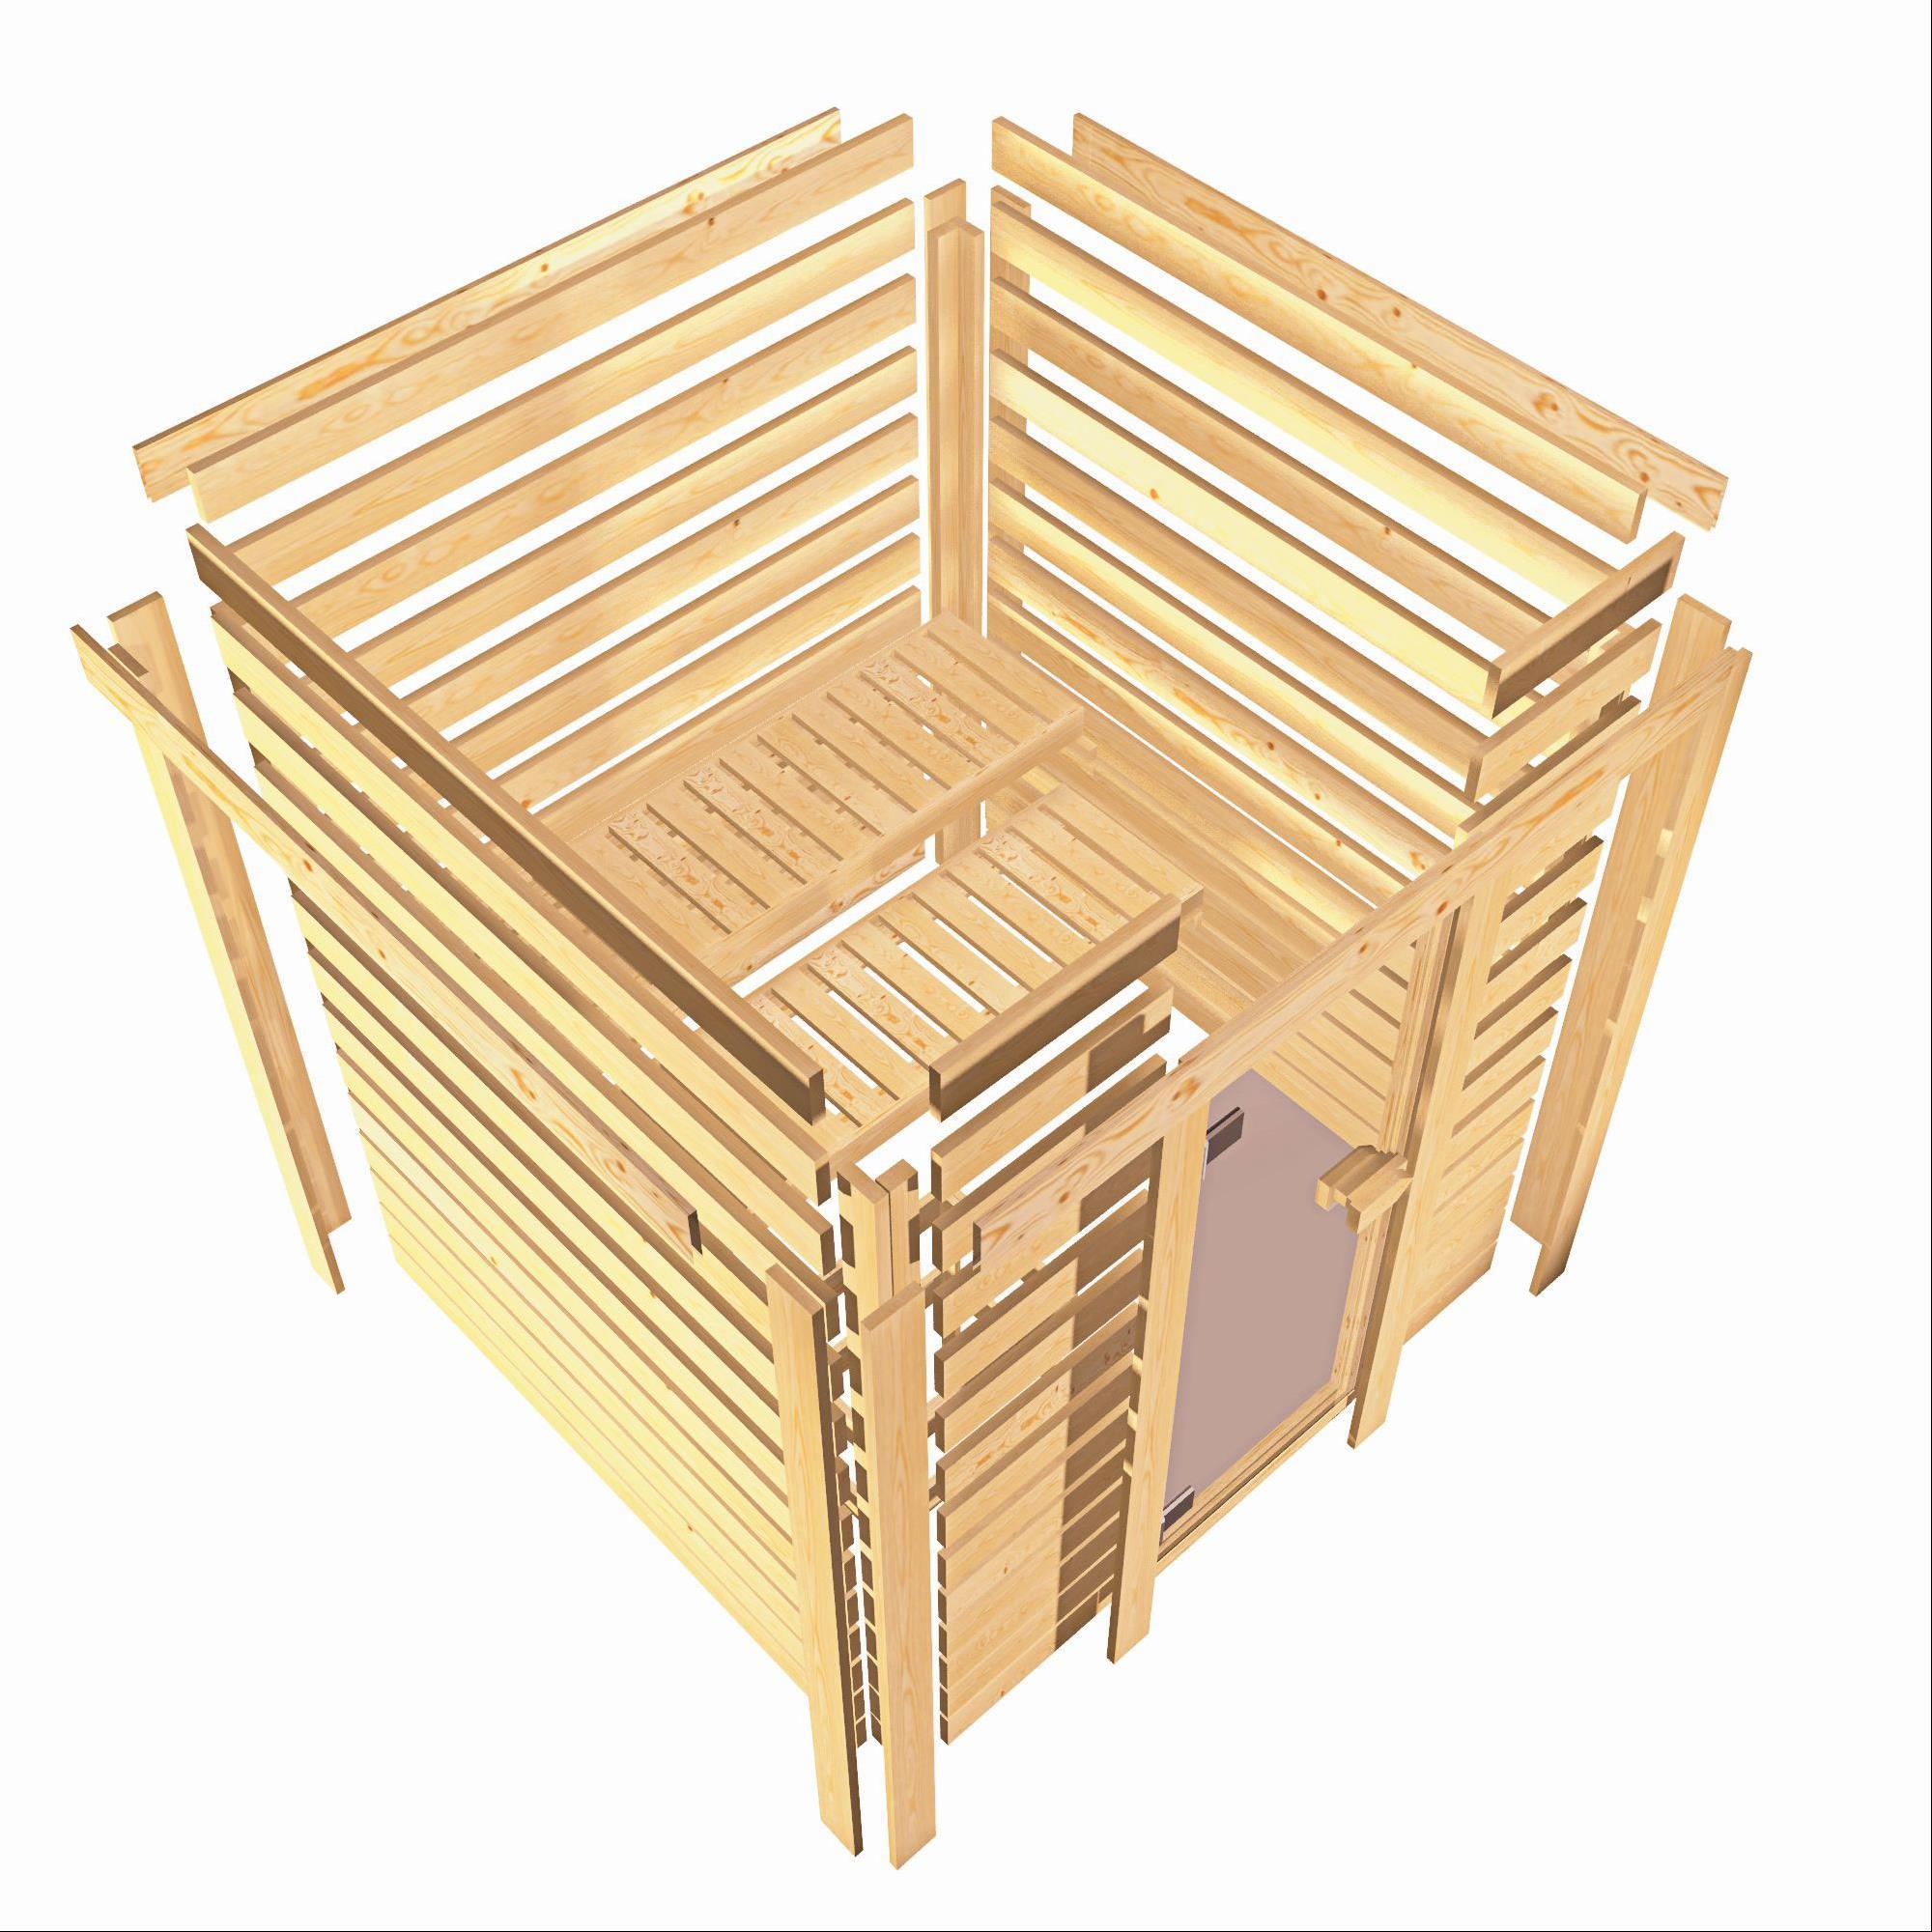 Woodfeeling Sauna Anja 38mm mit Saunaofen 9 kW extern moderne Tür Bild 4